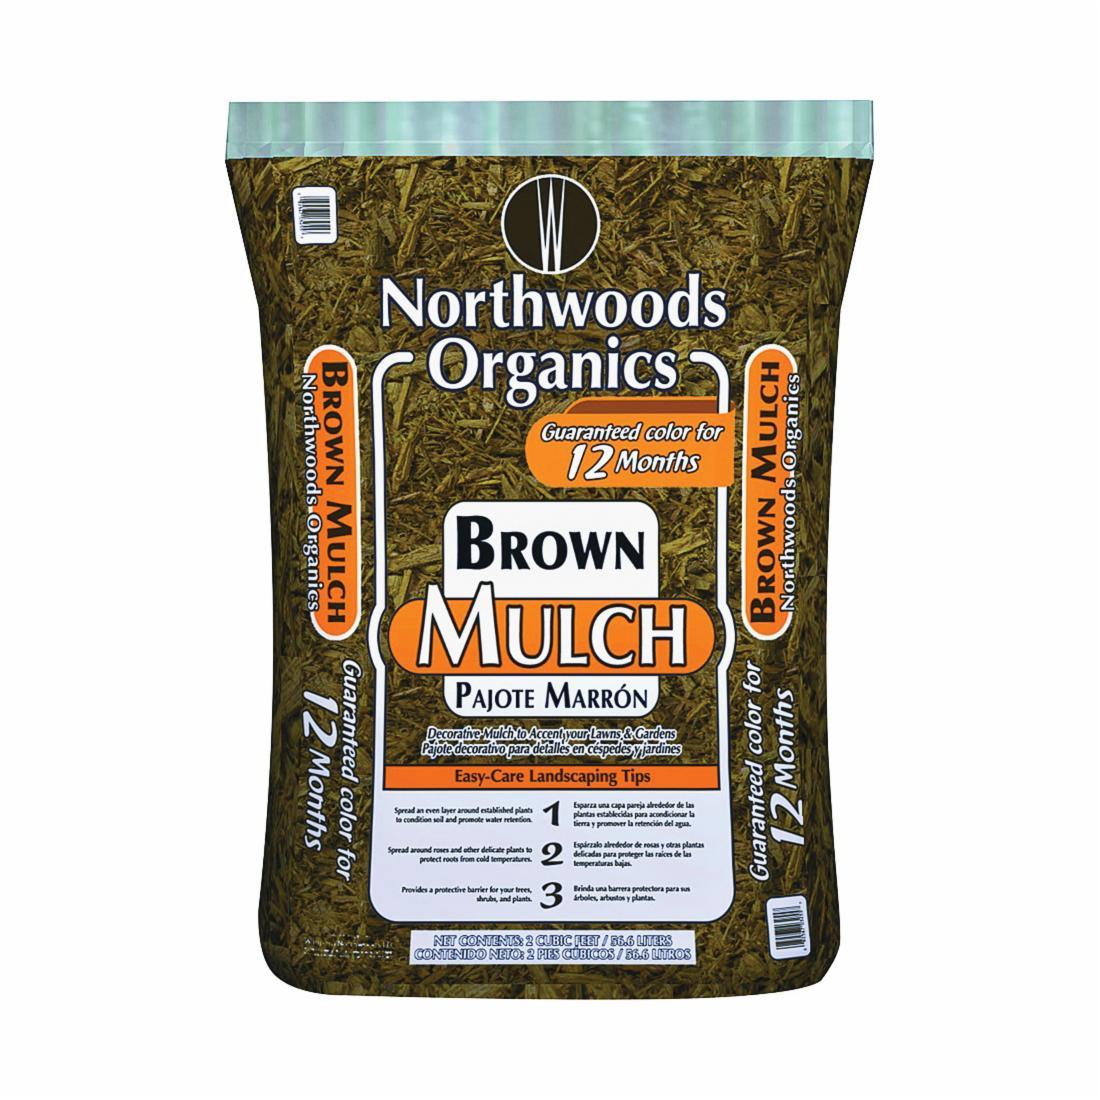 Northwoods Organics WNW03255